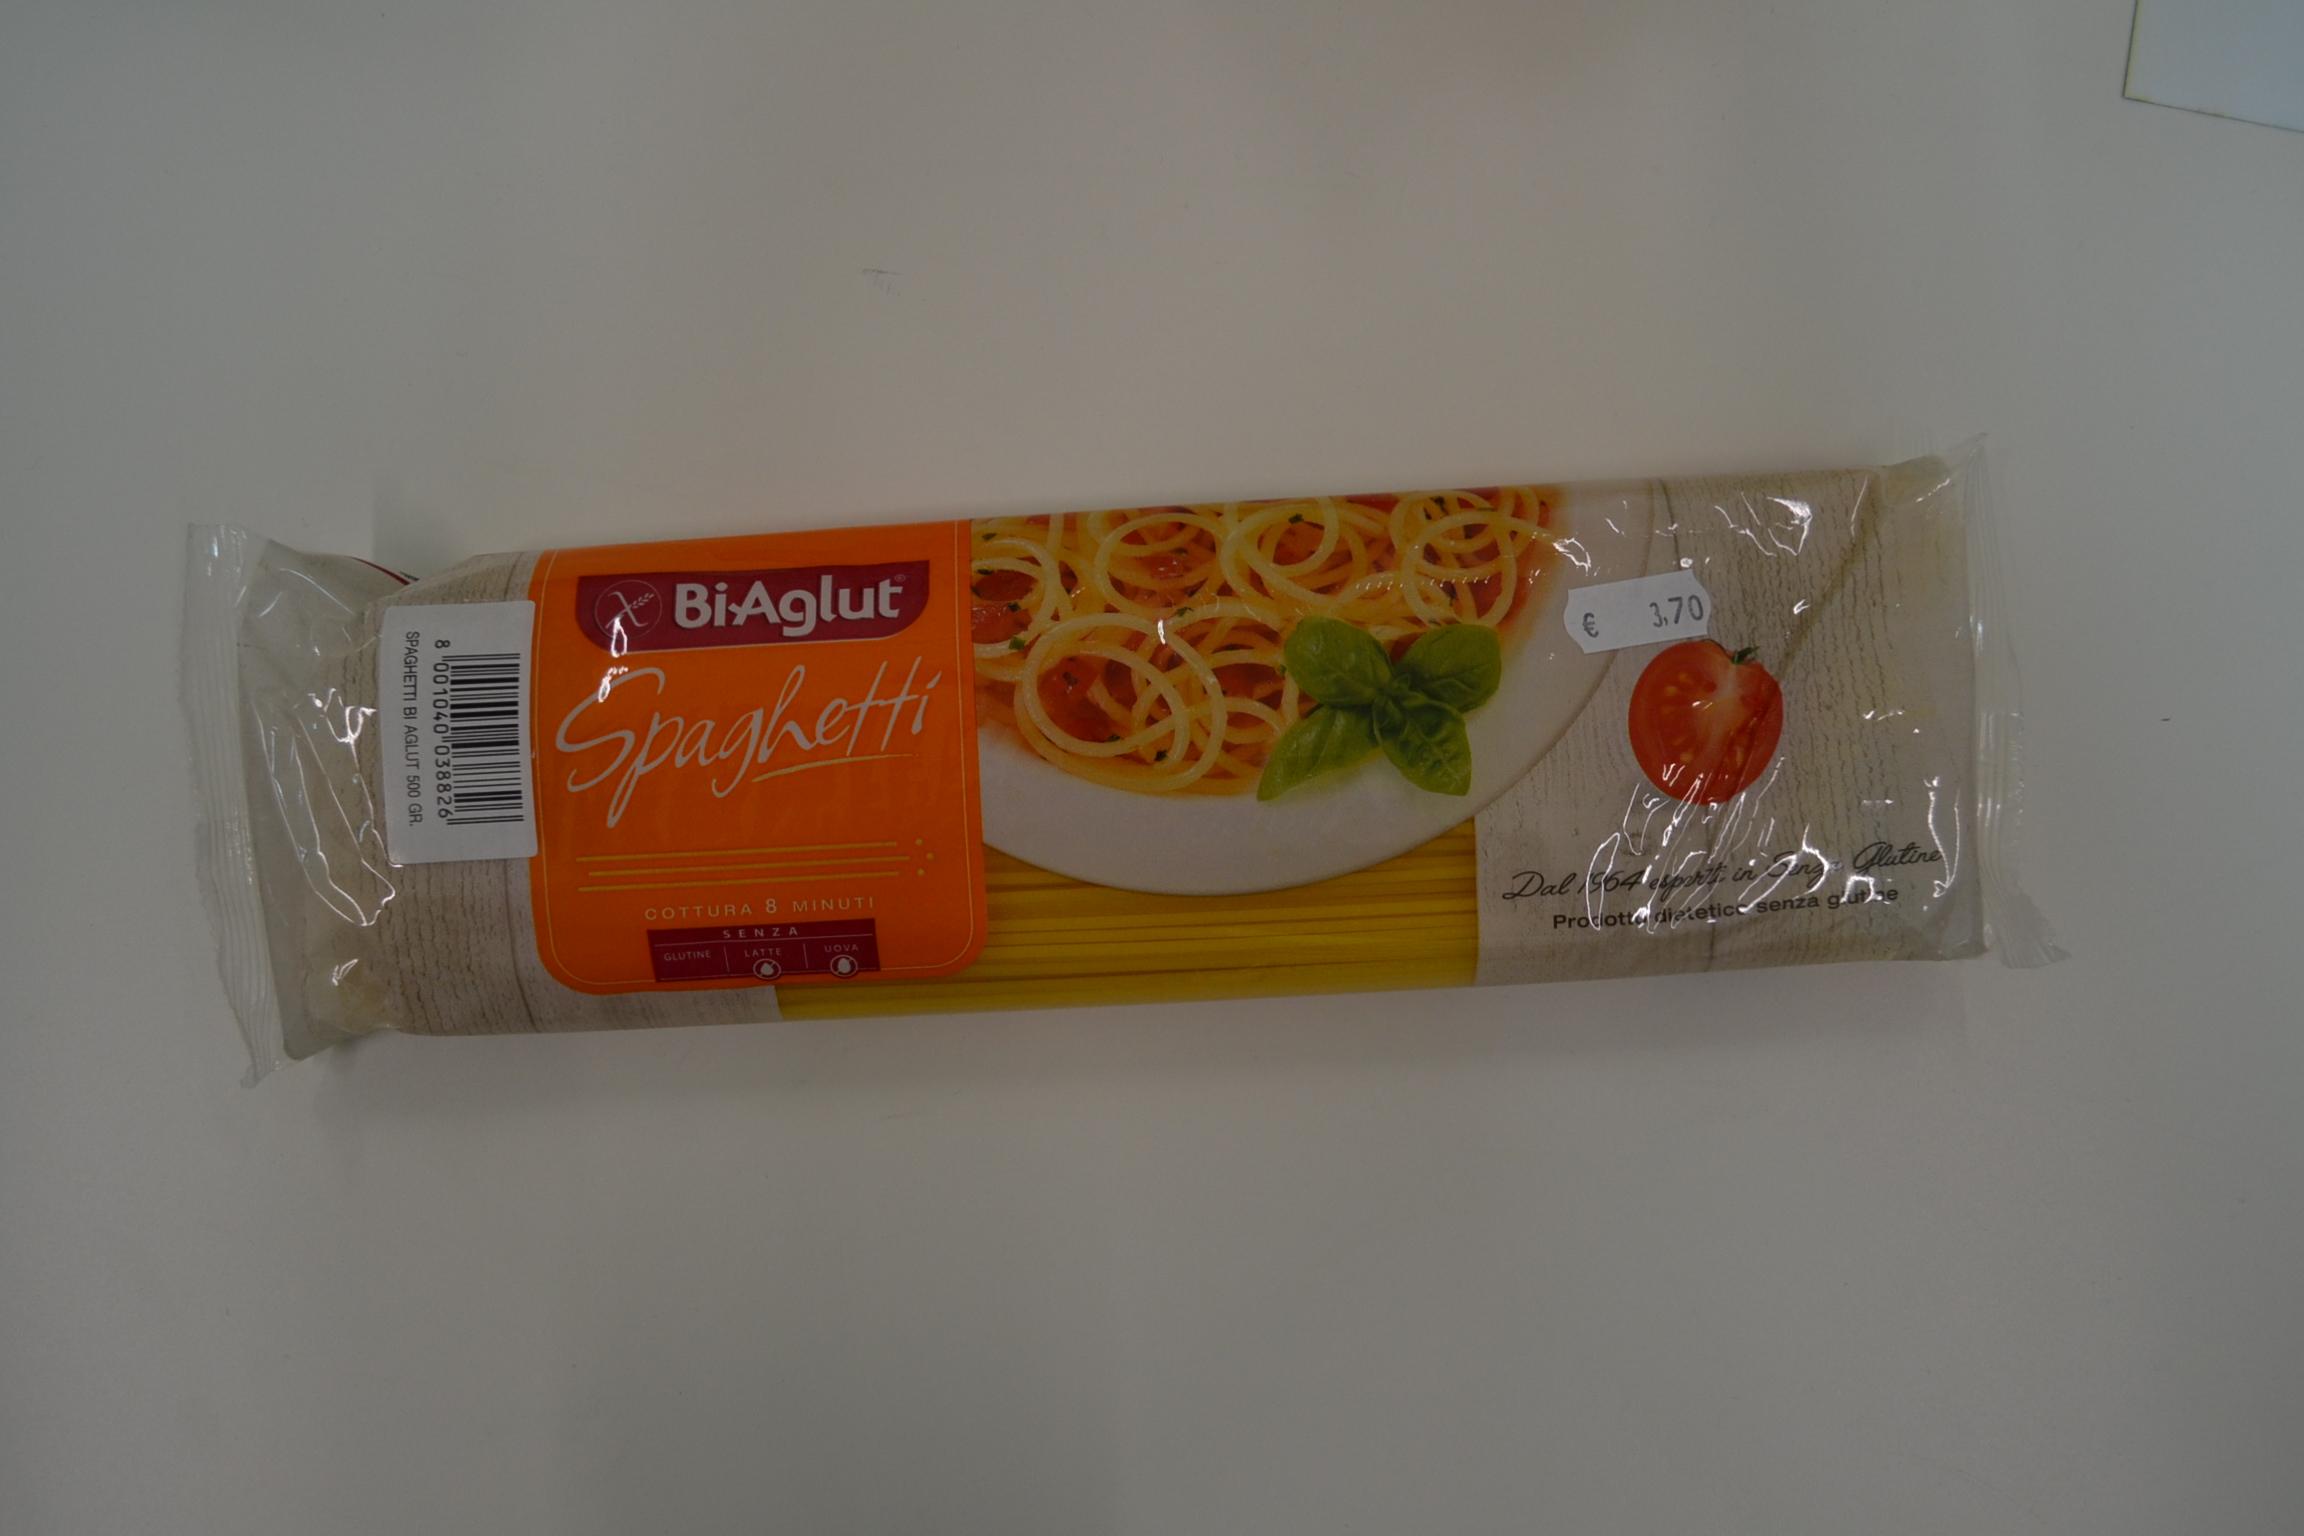 Spaghetti BIAGLUT € 3,70